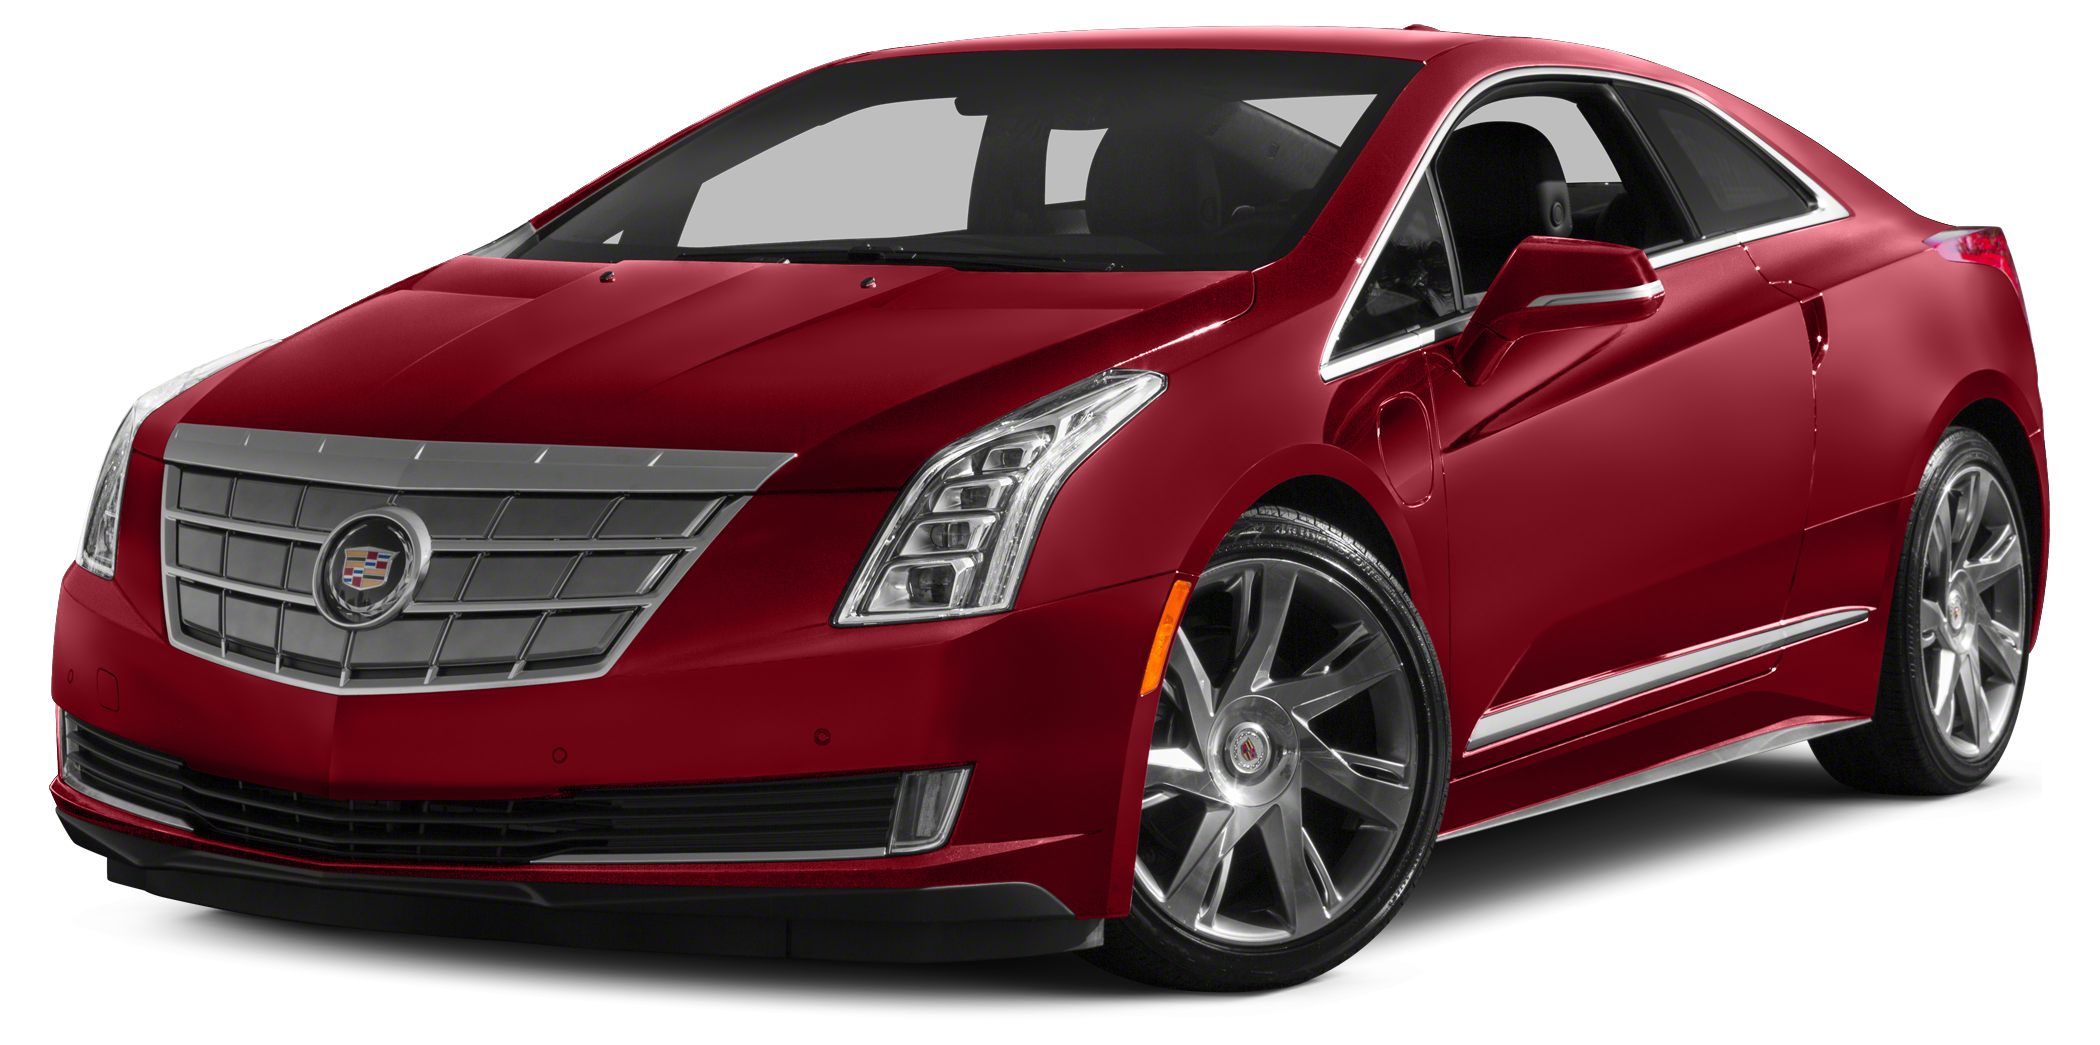 2014 Cadillac ELR Base Miles 14205Color Crystal Red Stock 600668 VIN 1G6RR1E48EU600668